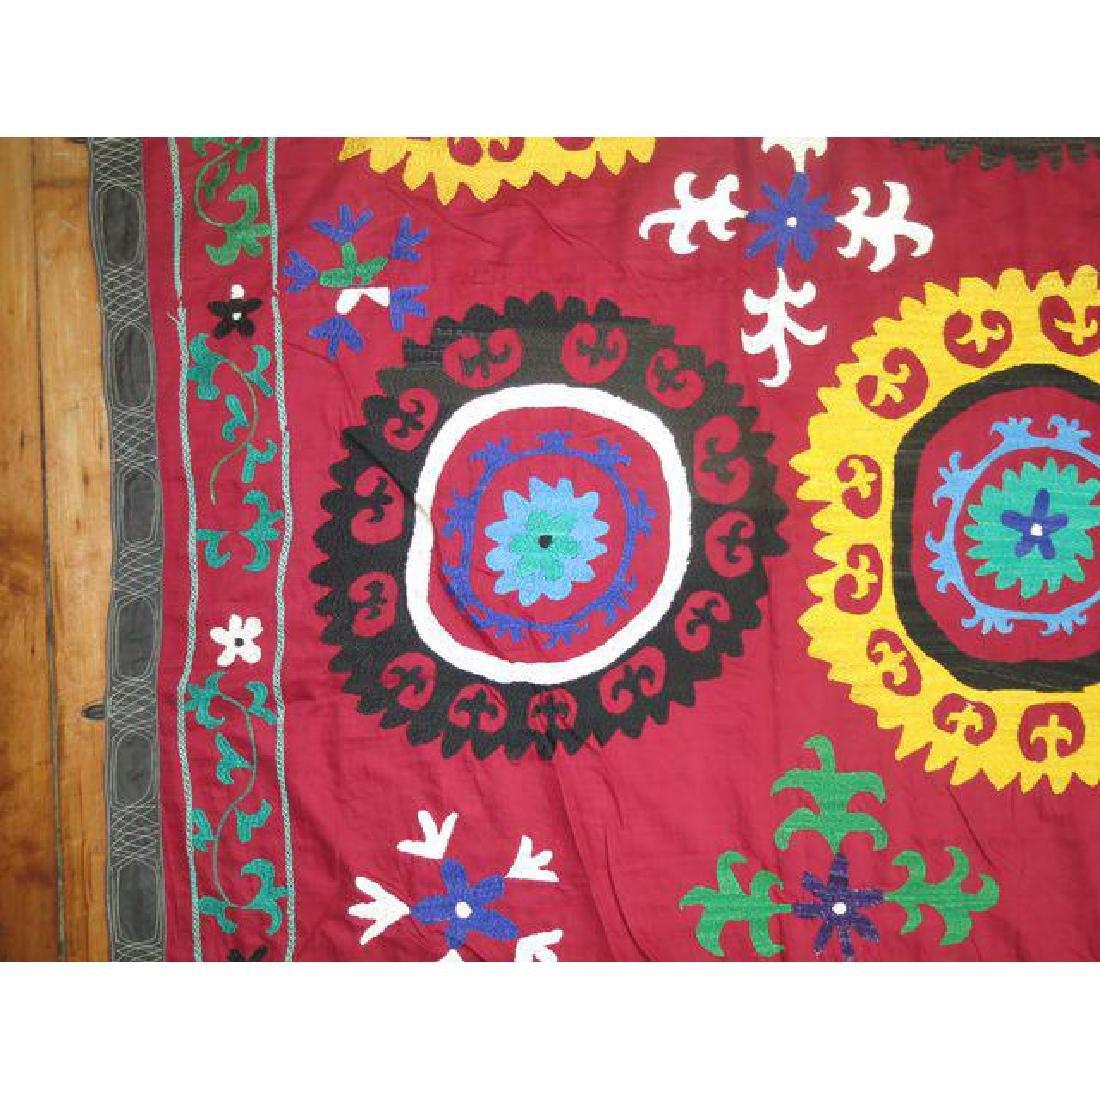 Vintage Suzanni Embroidery Throw 6.10x7.5 - 4